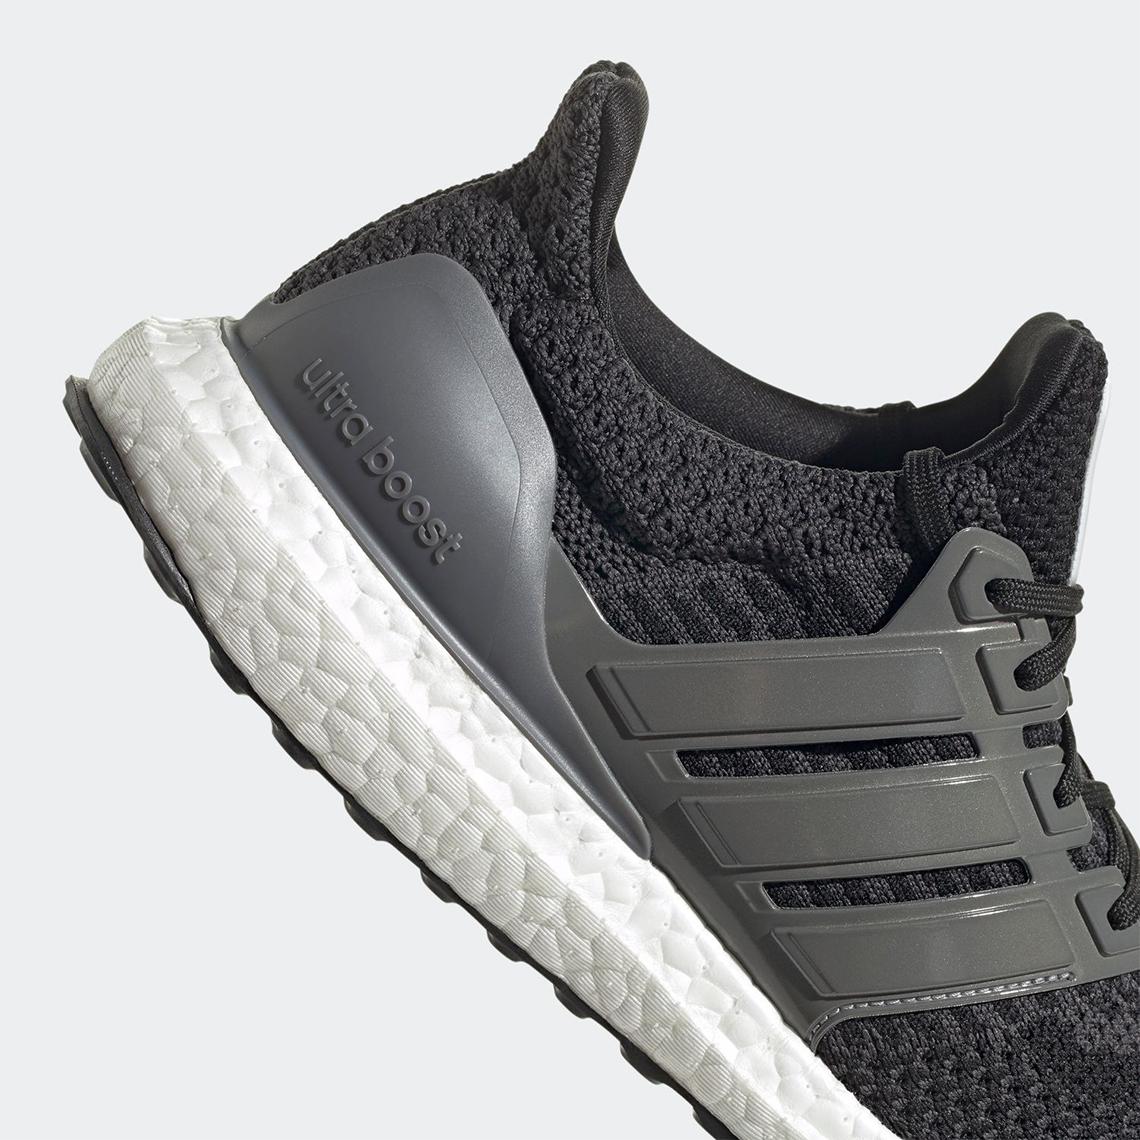 adidas-ultra-boost-nasa-black-FZ1855-1.jpg?w=1140